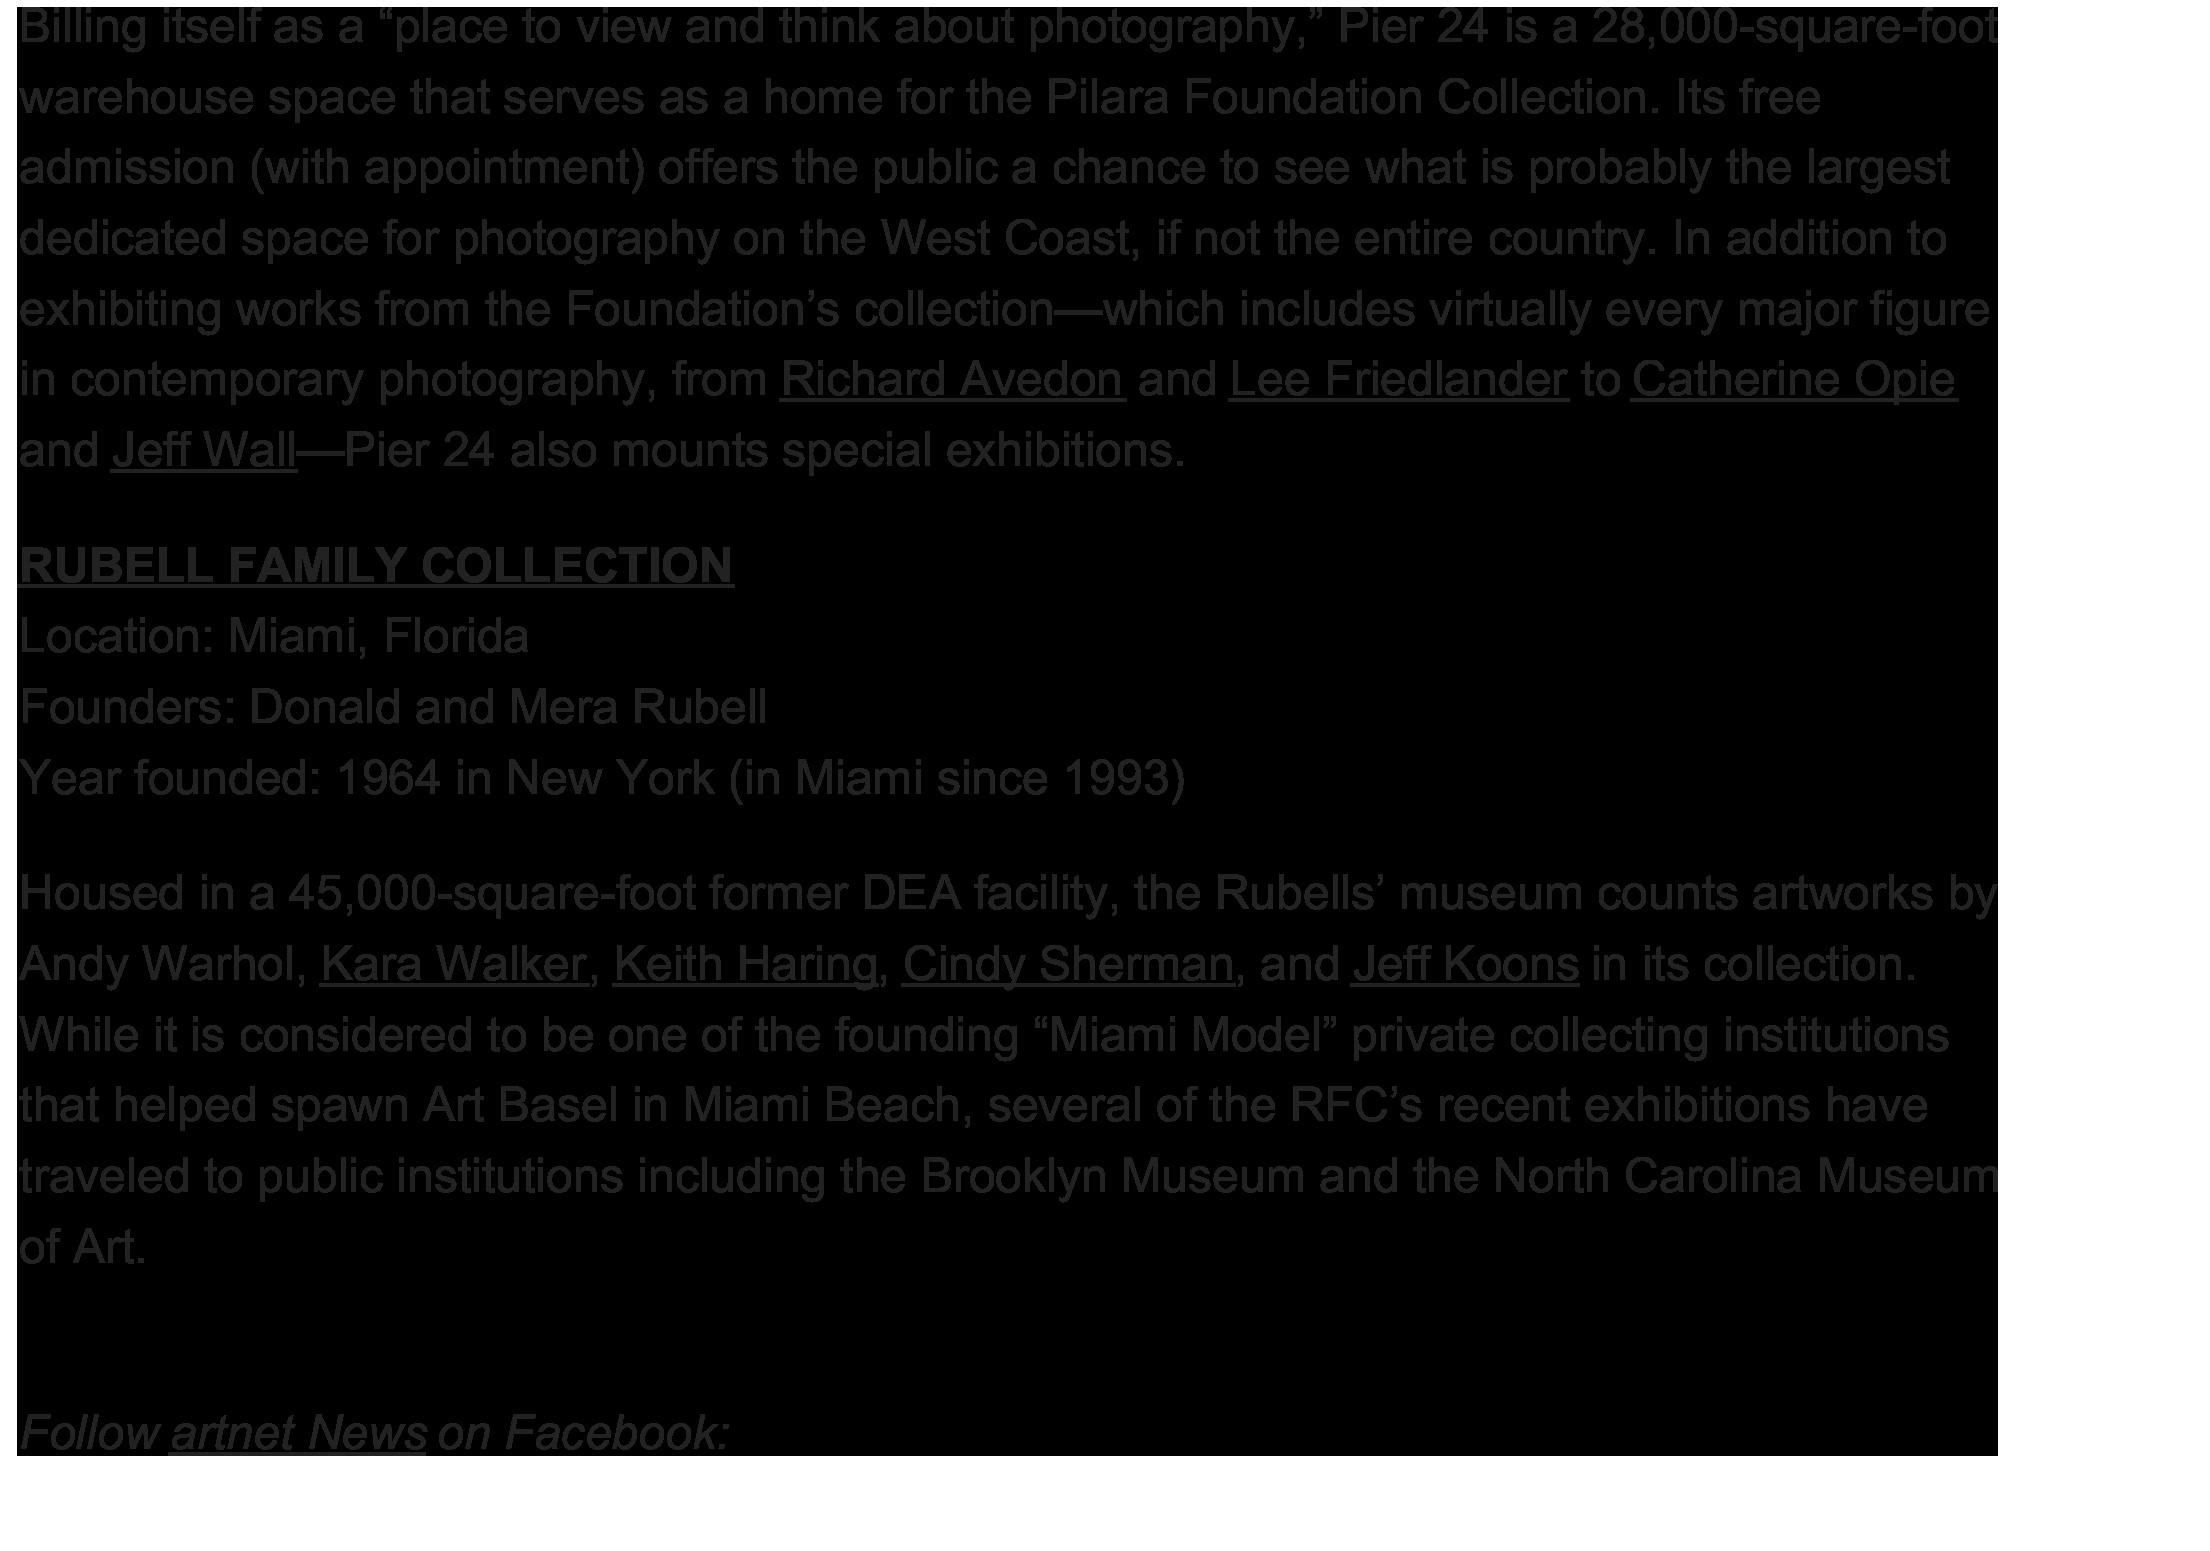 news.artnet.com-What-Are-Americas-Top-10-Private-Contemporary-Art-Museums-(1)-4.png